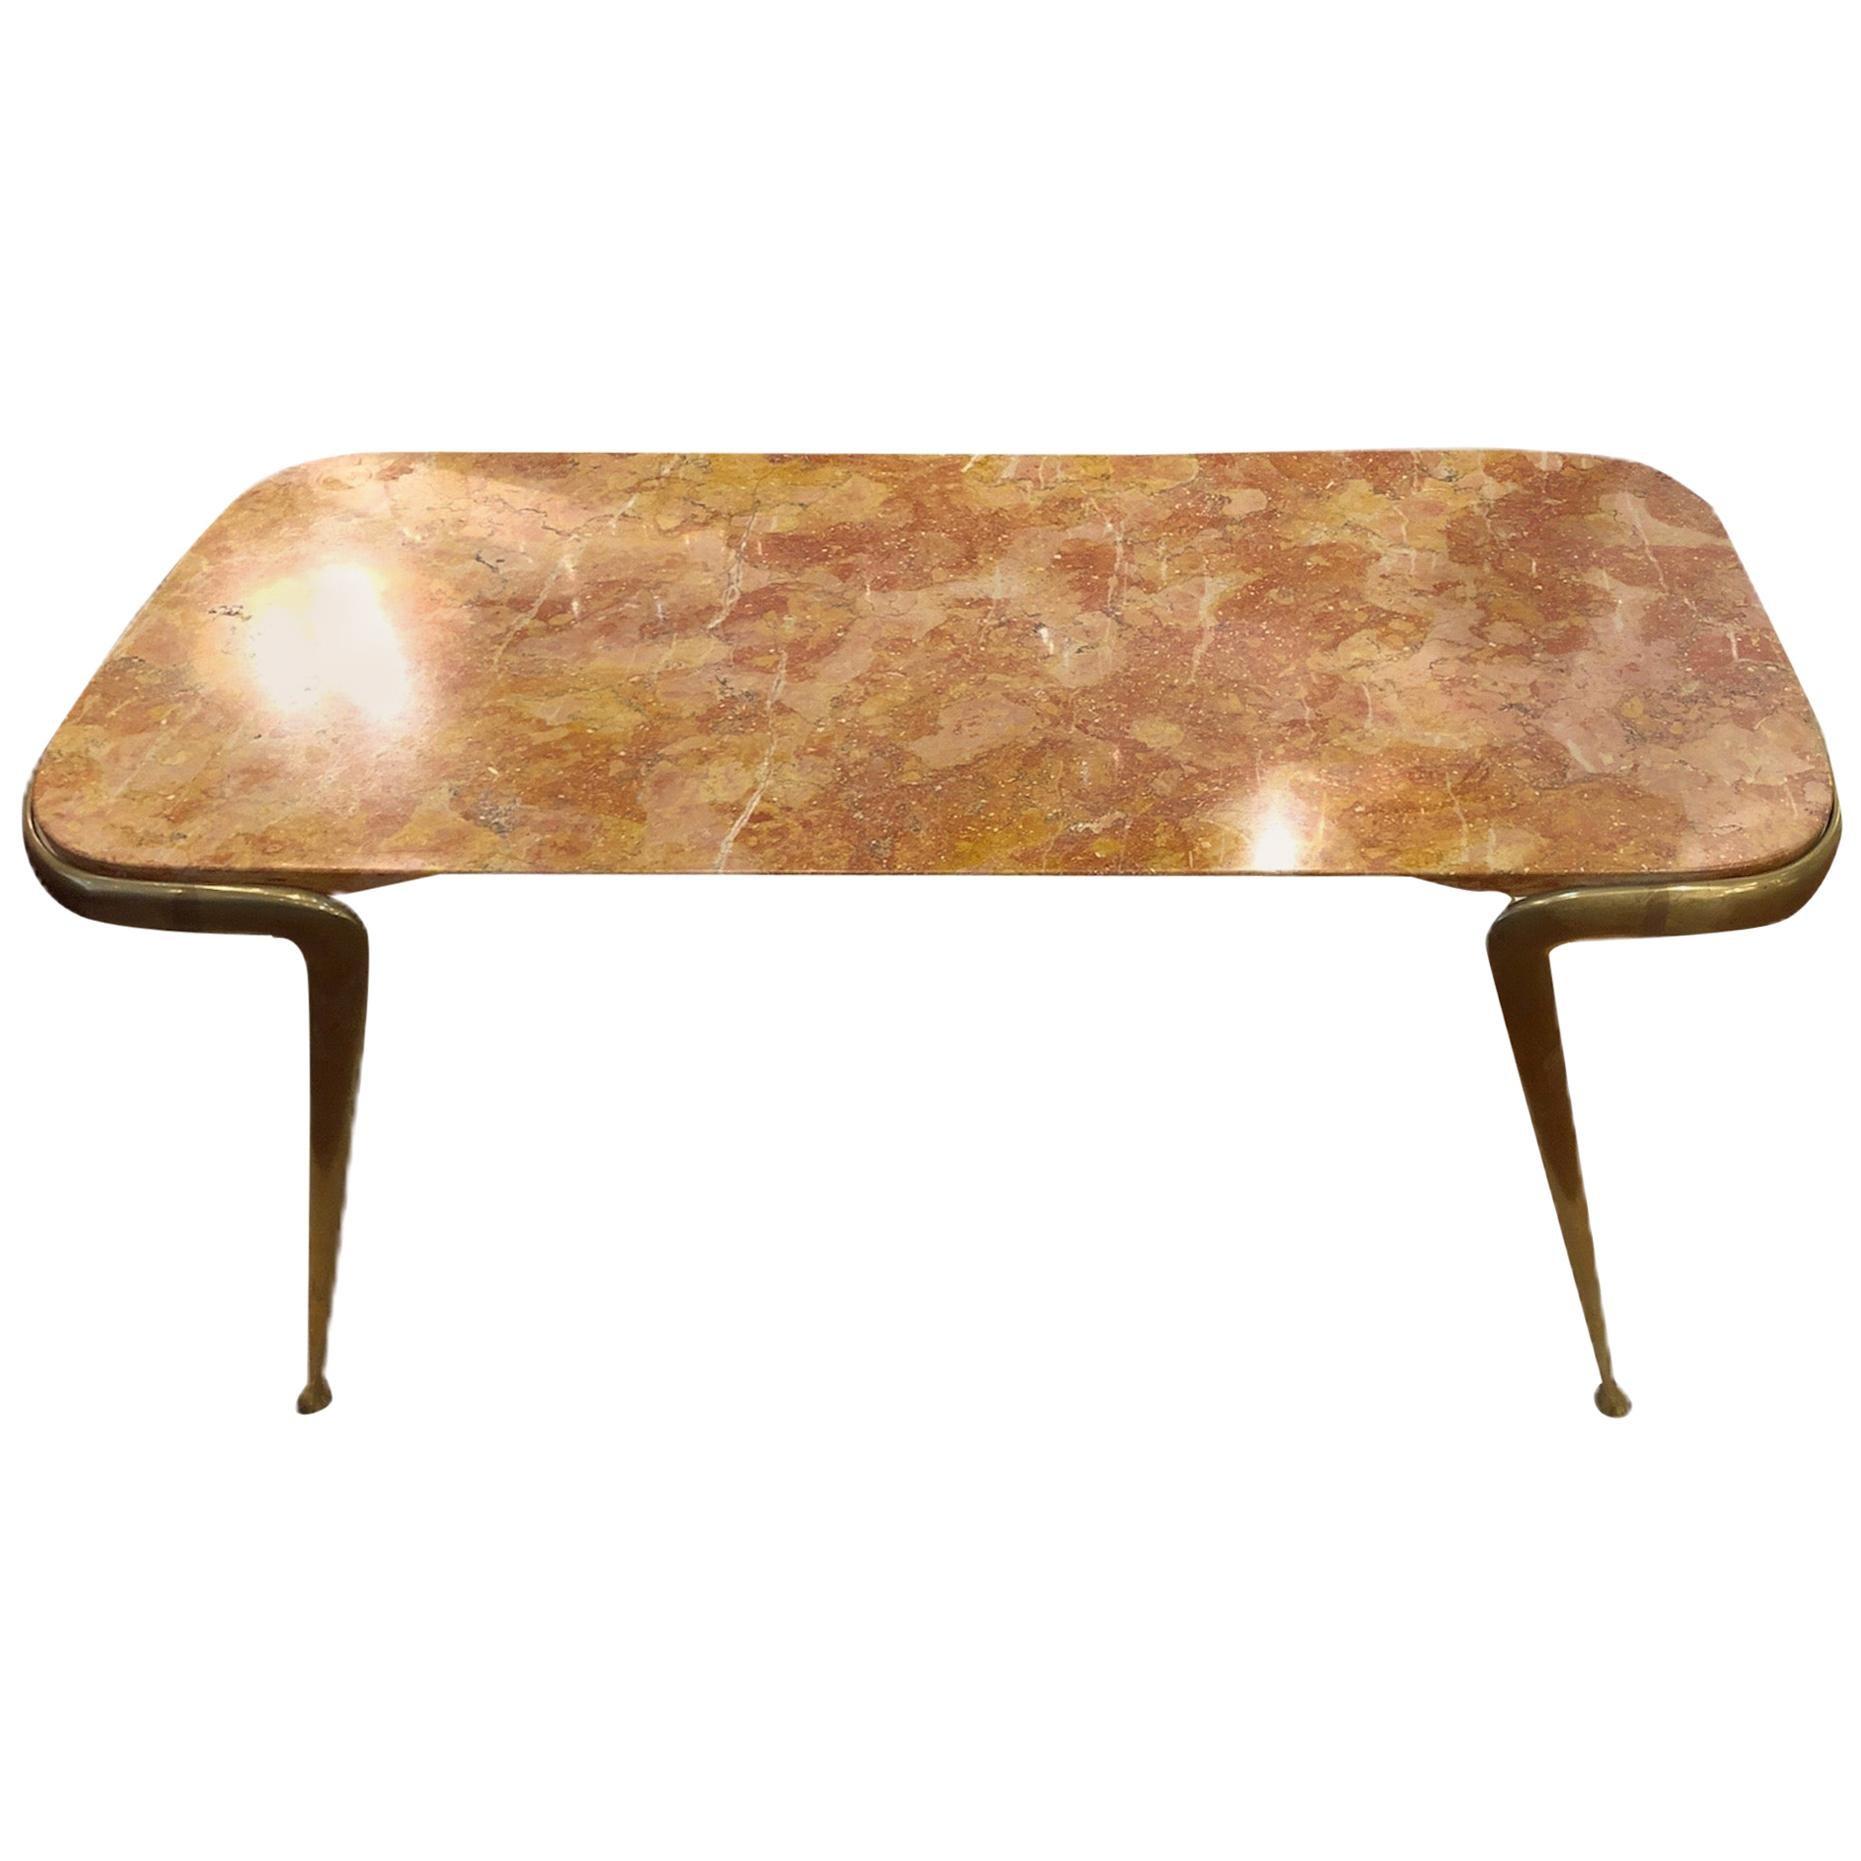 Coffee Table Italian 1960 Breccia Marble and Brass